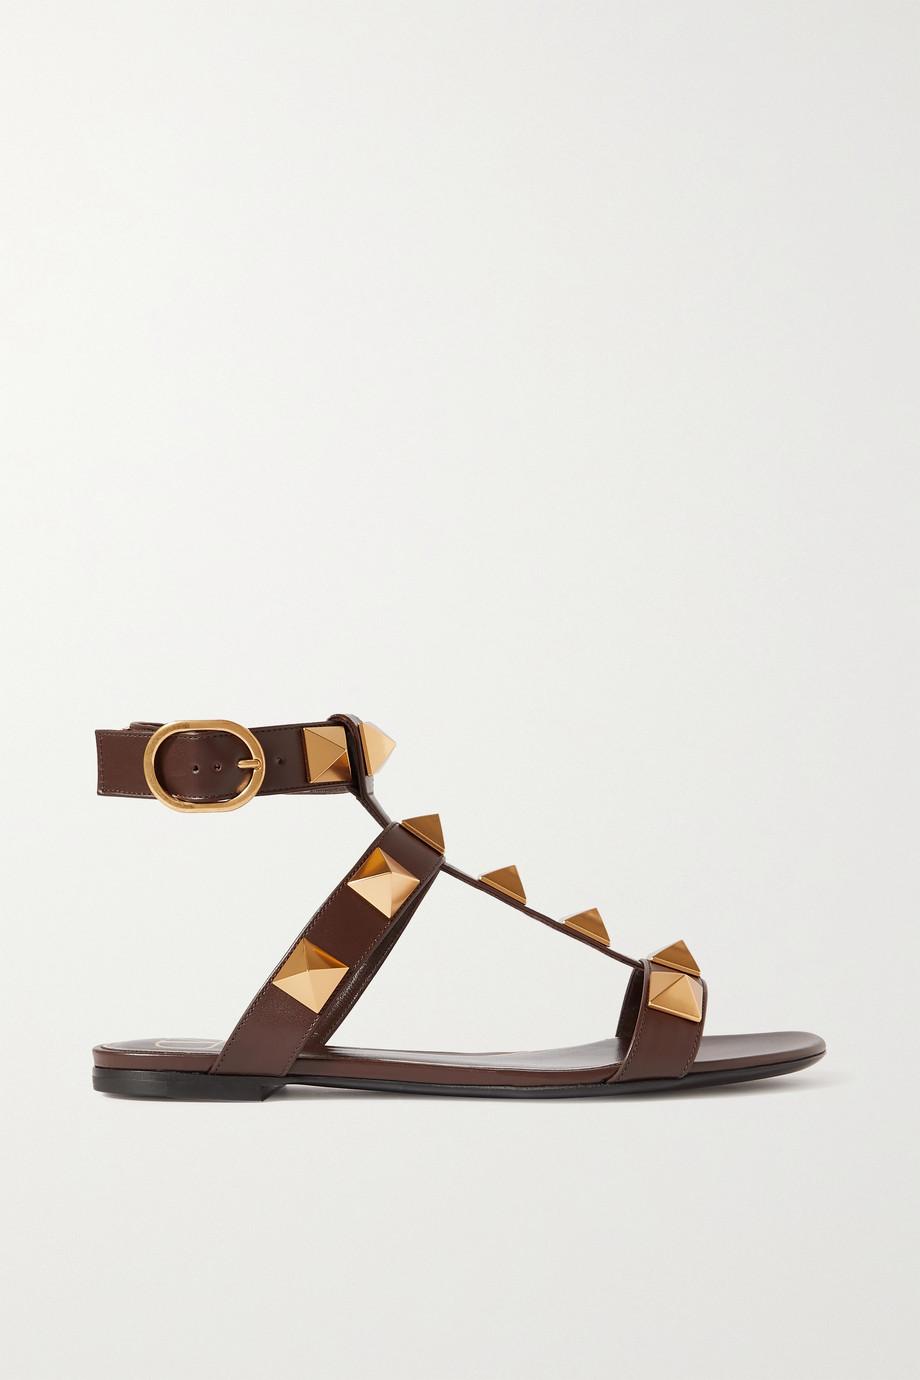 Valentino Valentino Garavani Roman Stud leather sandals